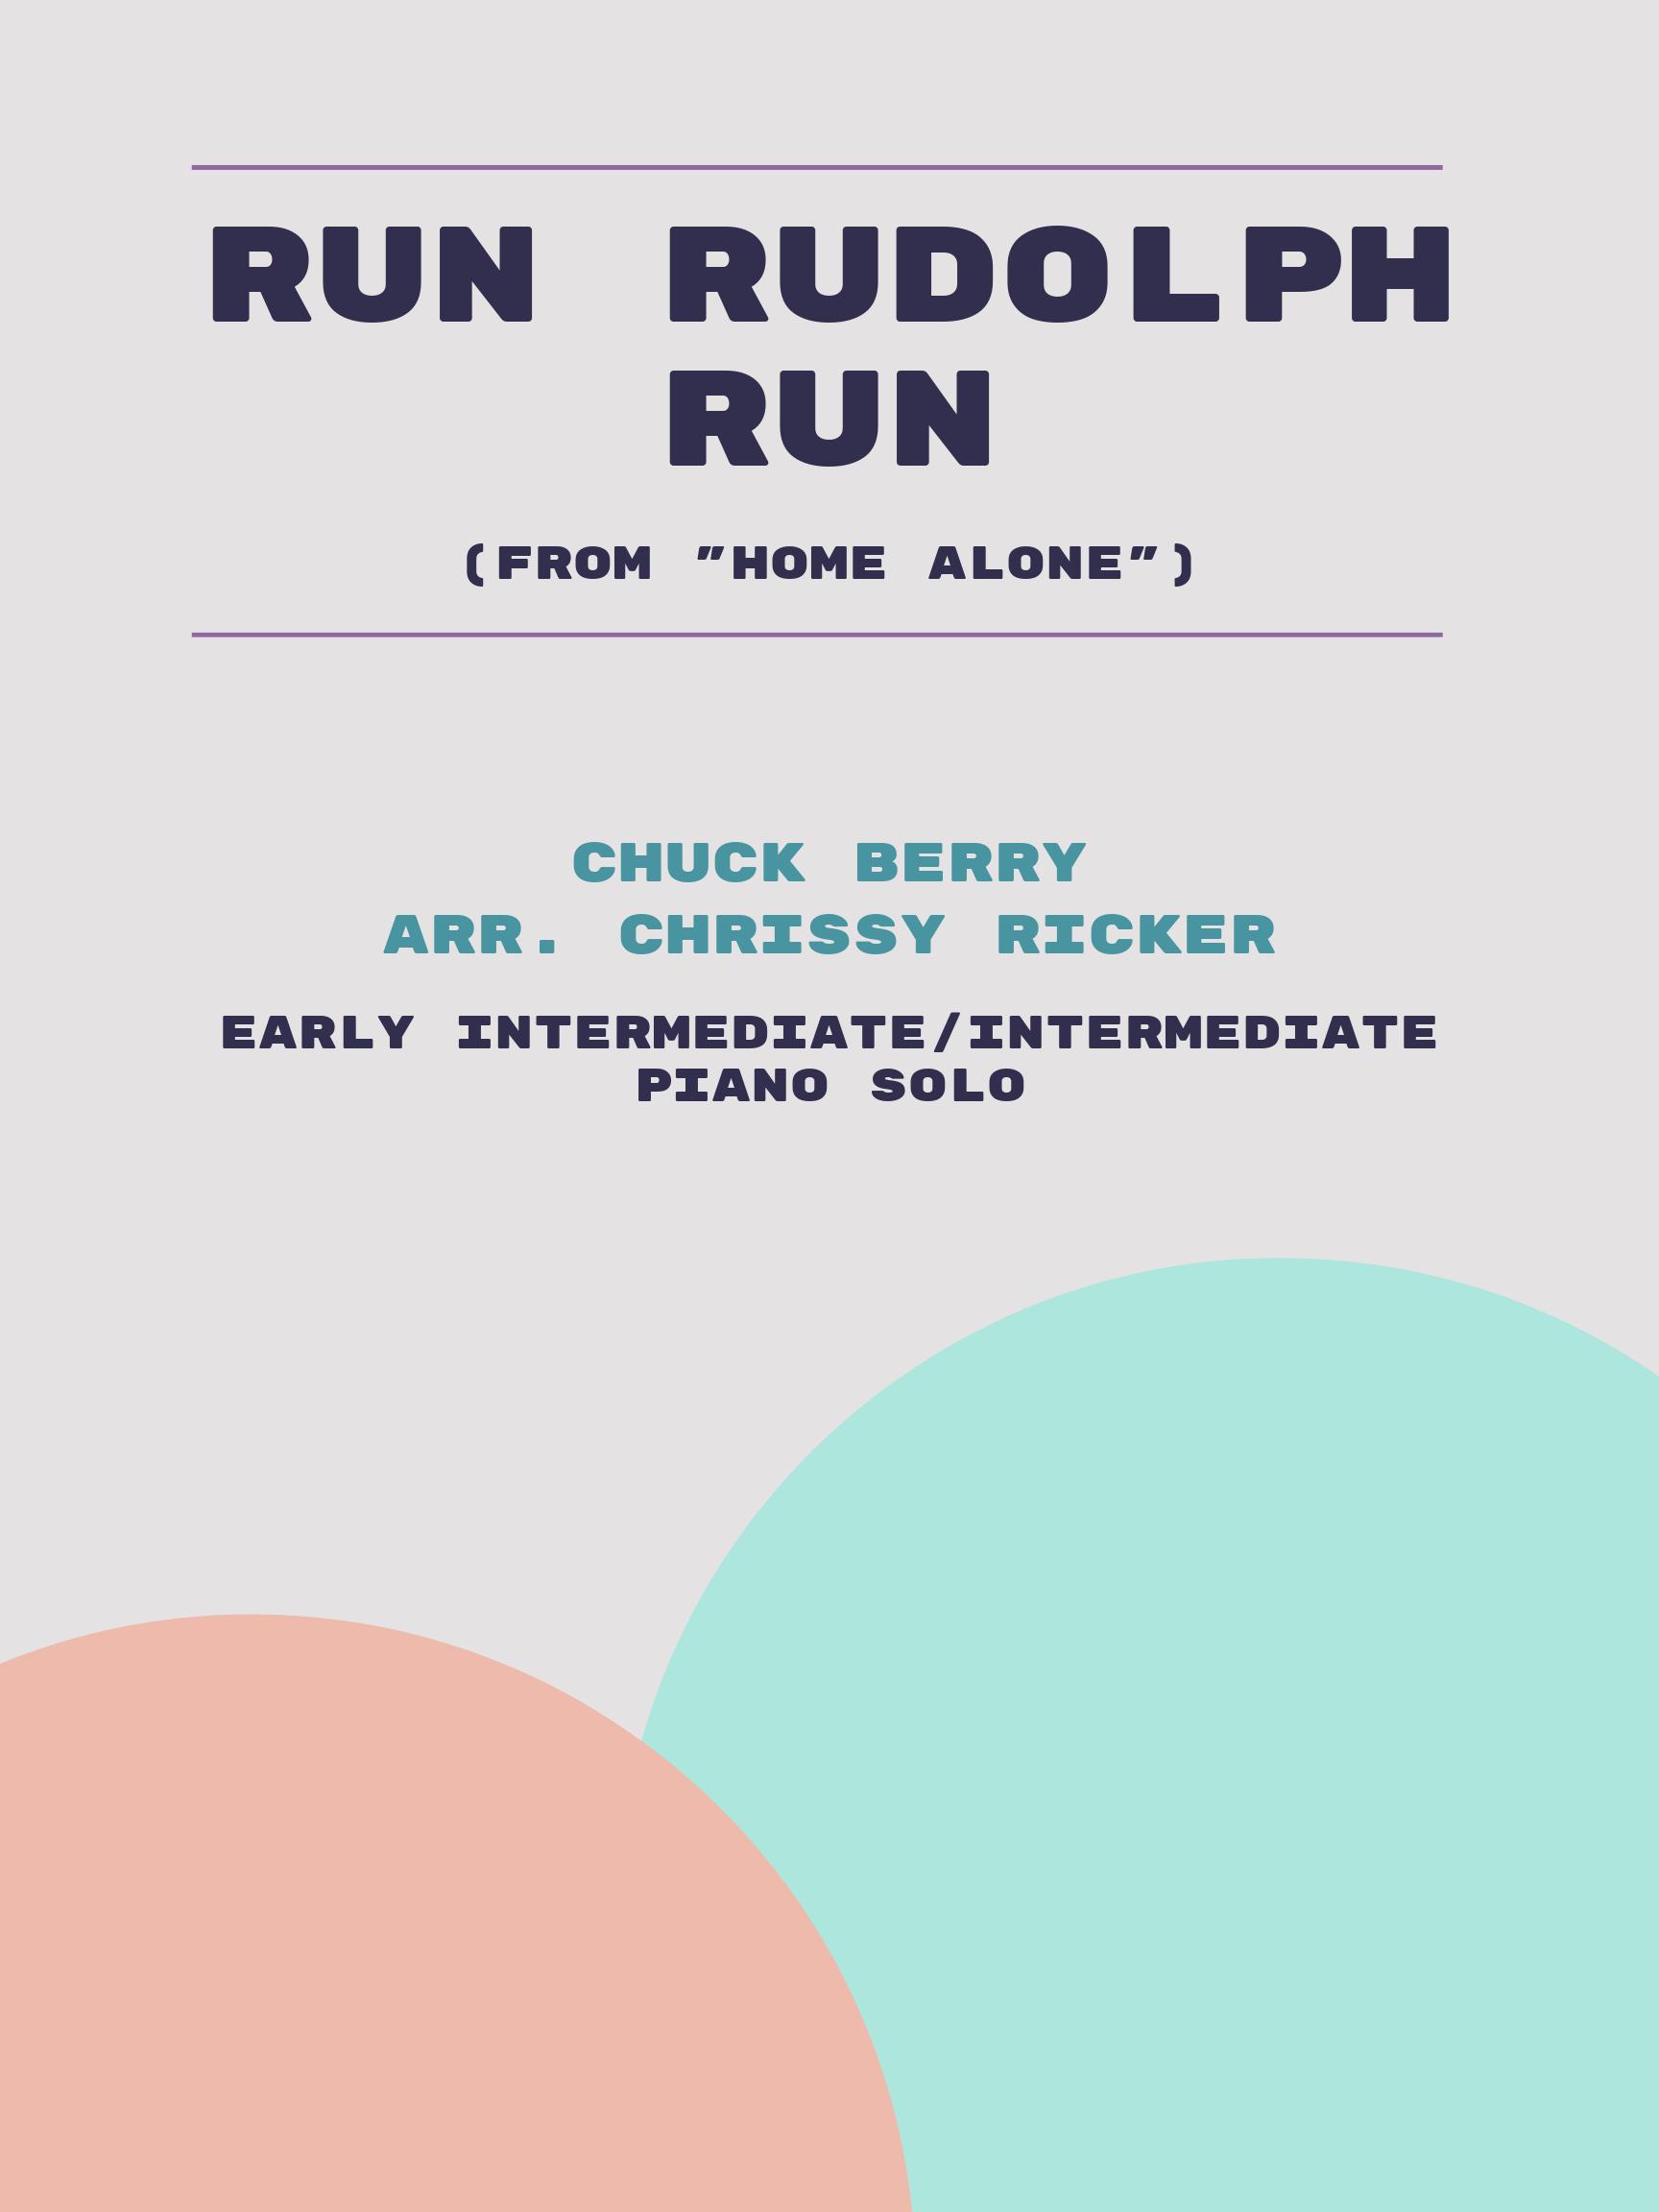 Run Rudolph Run by Chuck Berry